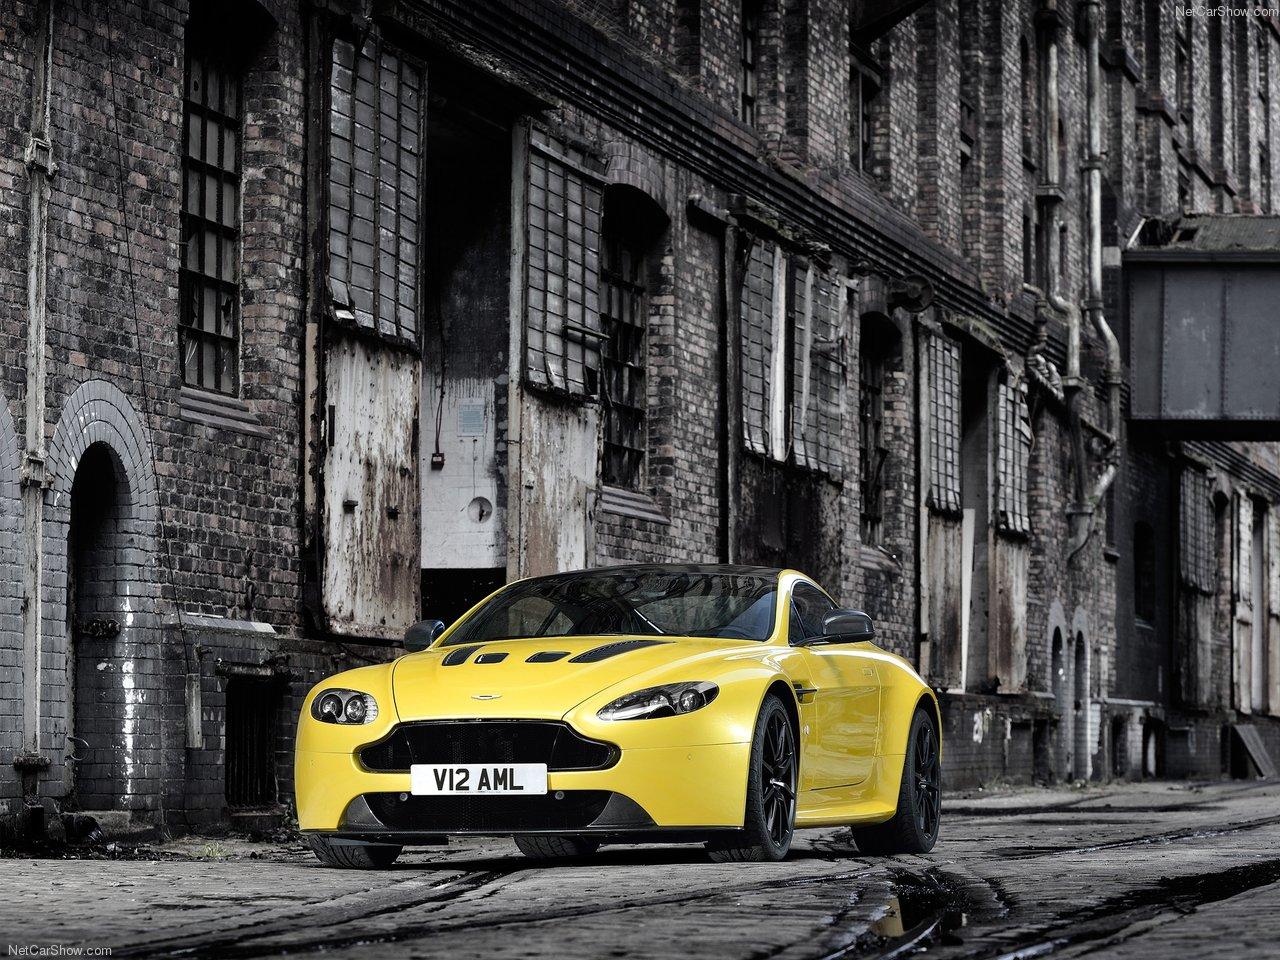 Aaa Luxury Sports Car Rental 2014 Aston Martin V12 Vantage S